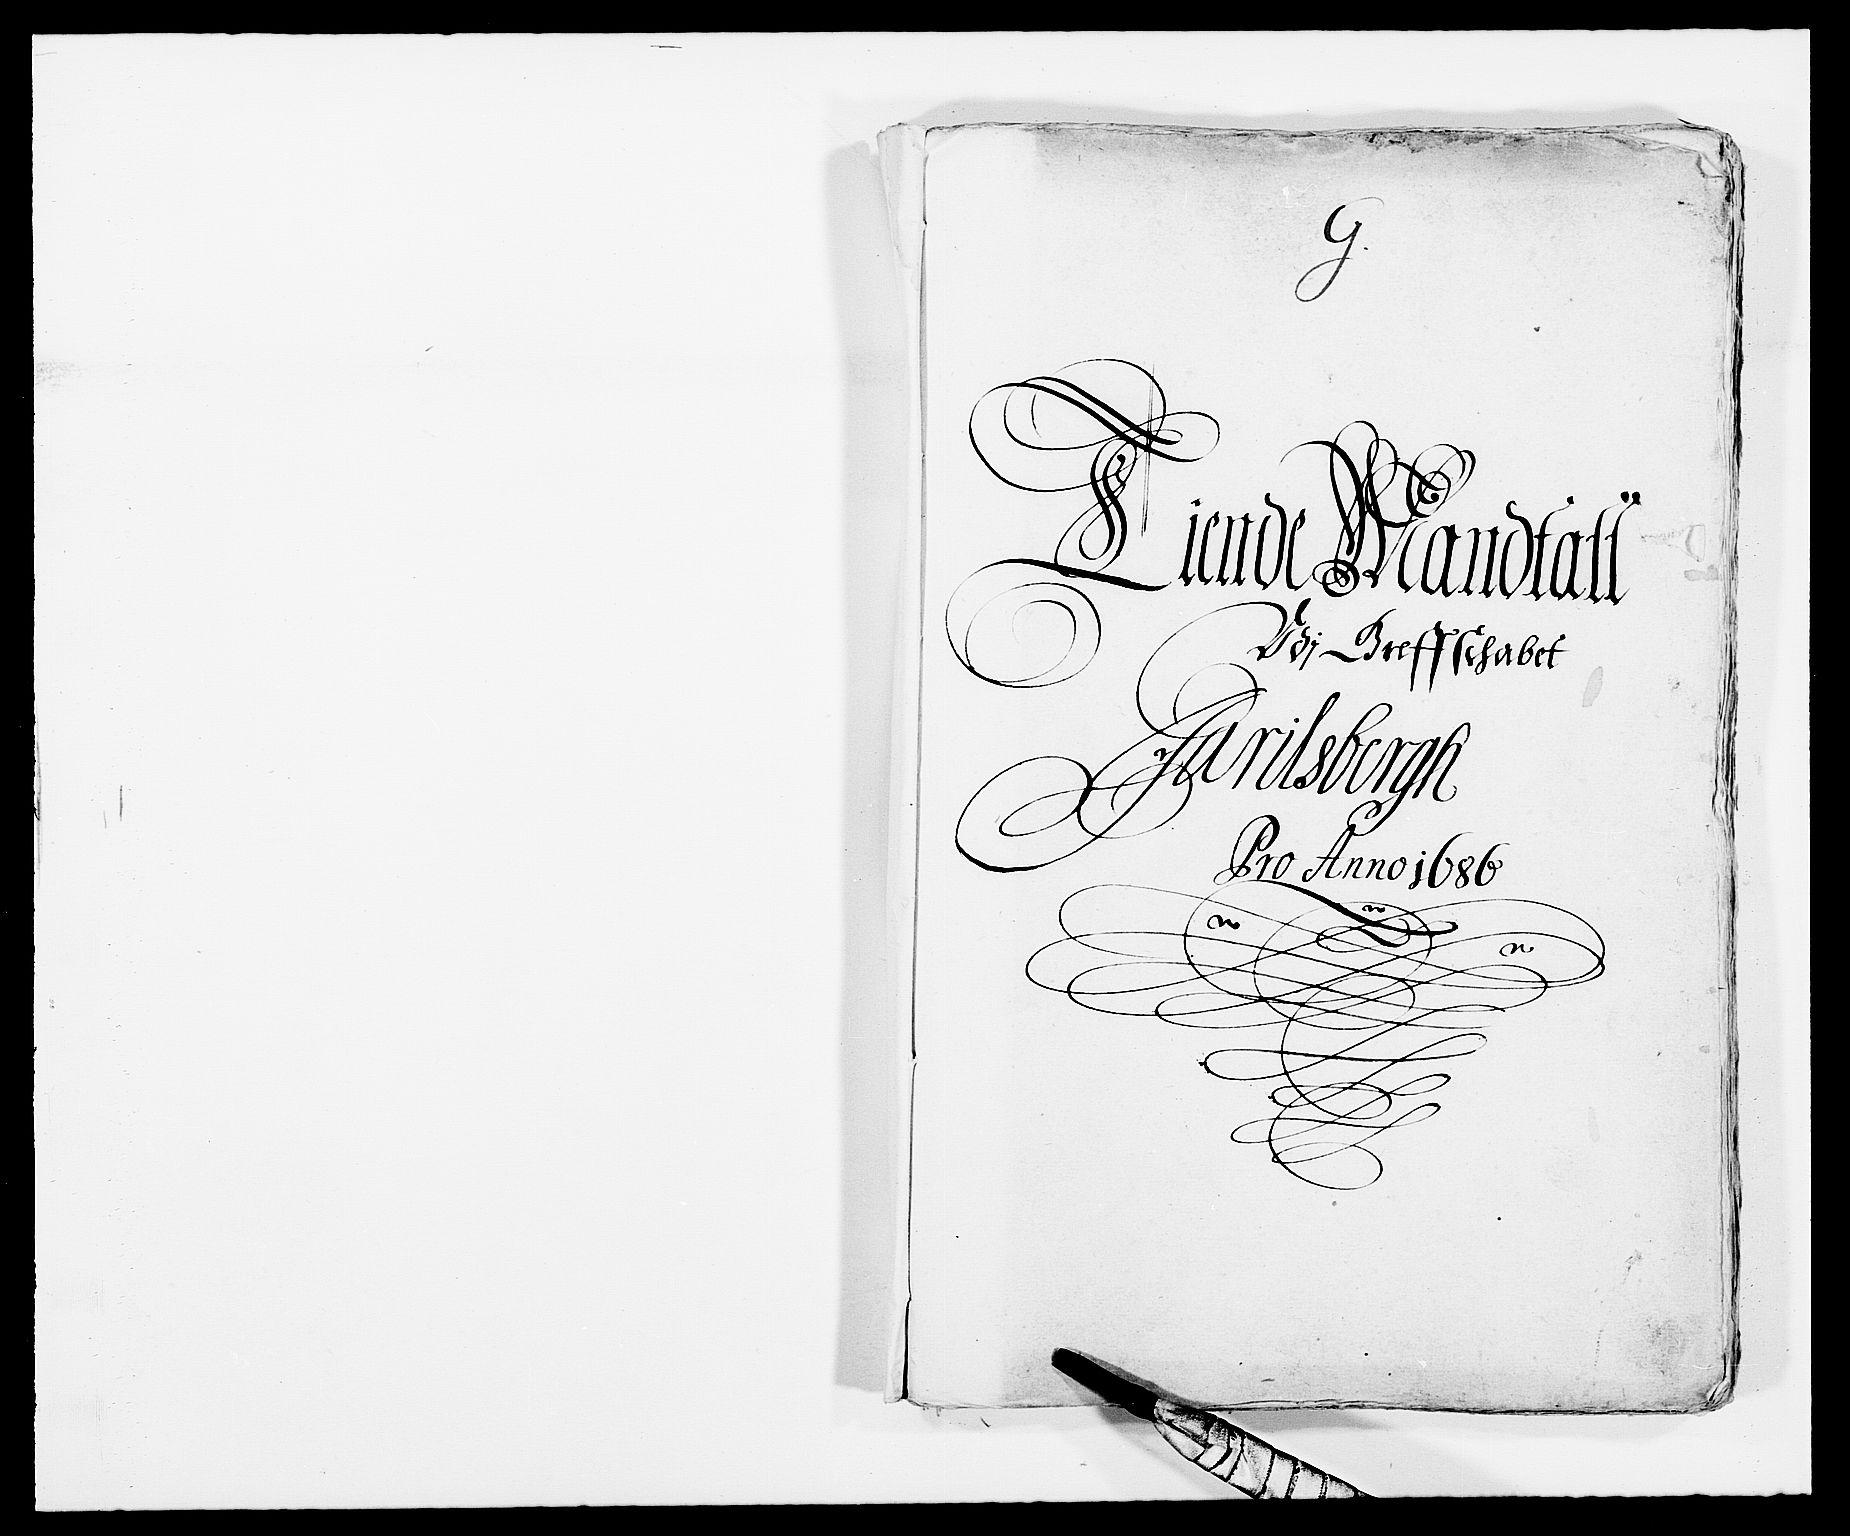 RA, Rentekammeret inntil 1814, Reviderte regnskaper, Fogderegnskap, R32/L1857: Fogderegnskap Jarlsberg grevskap, 1686-1690, s. 296